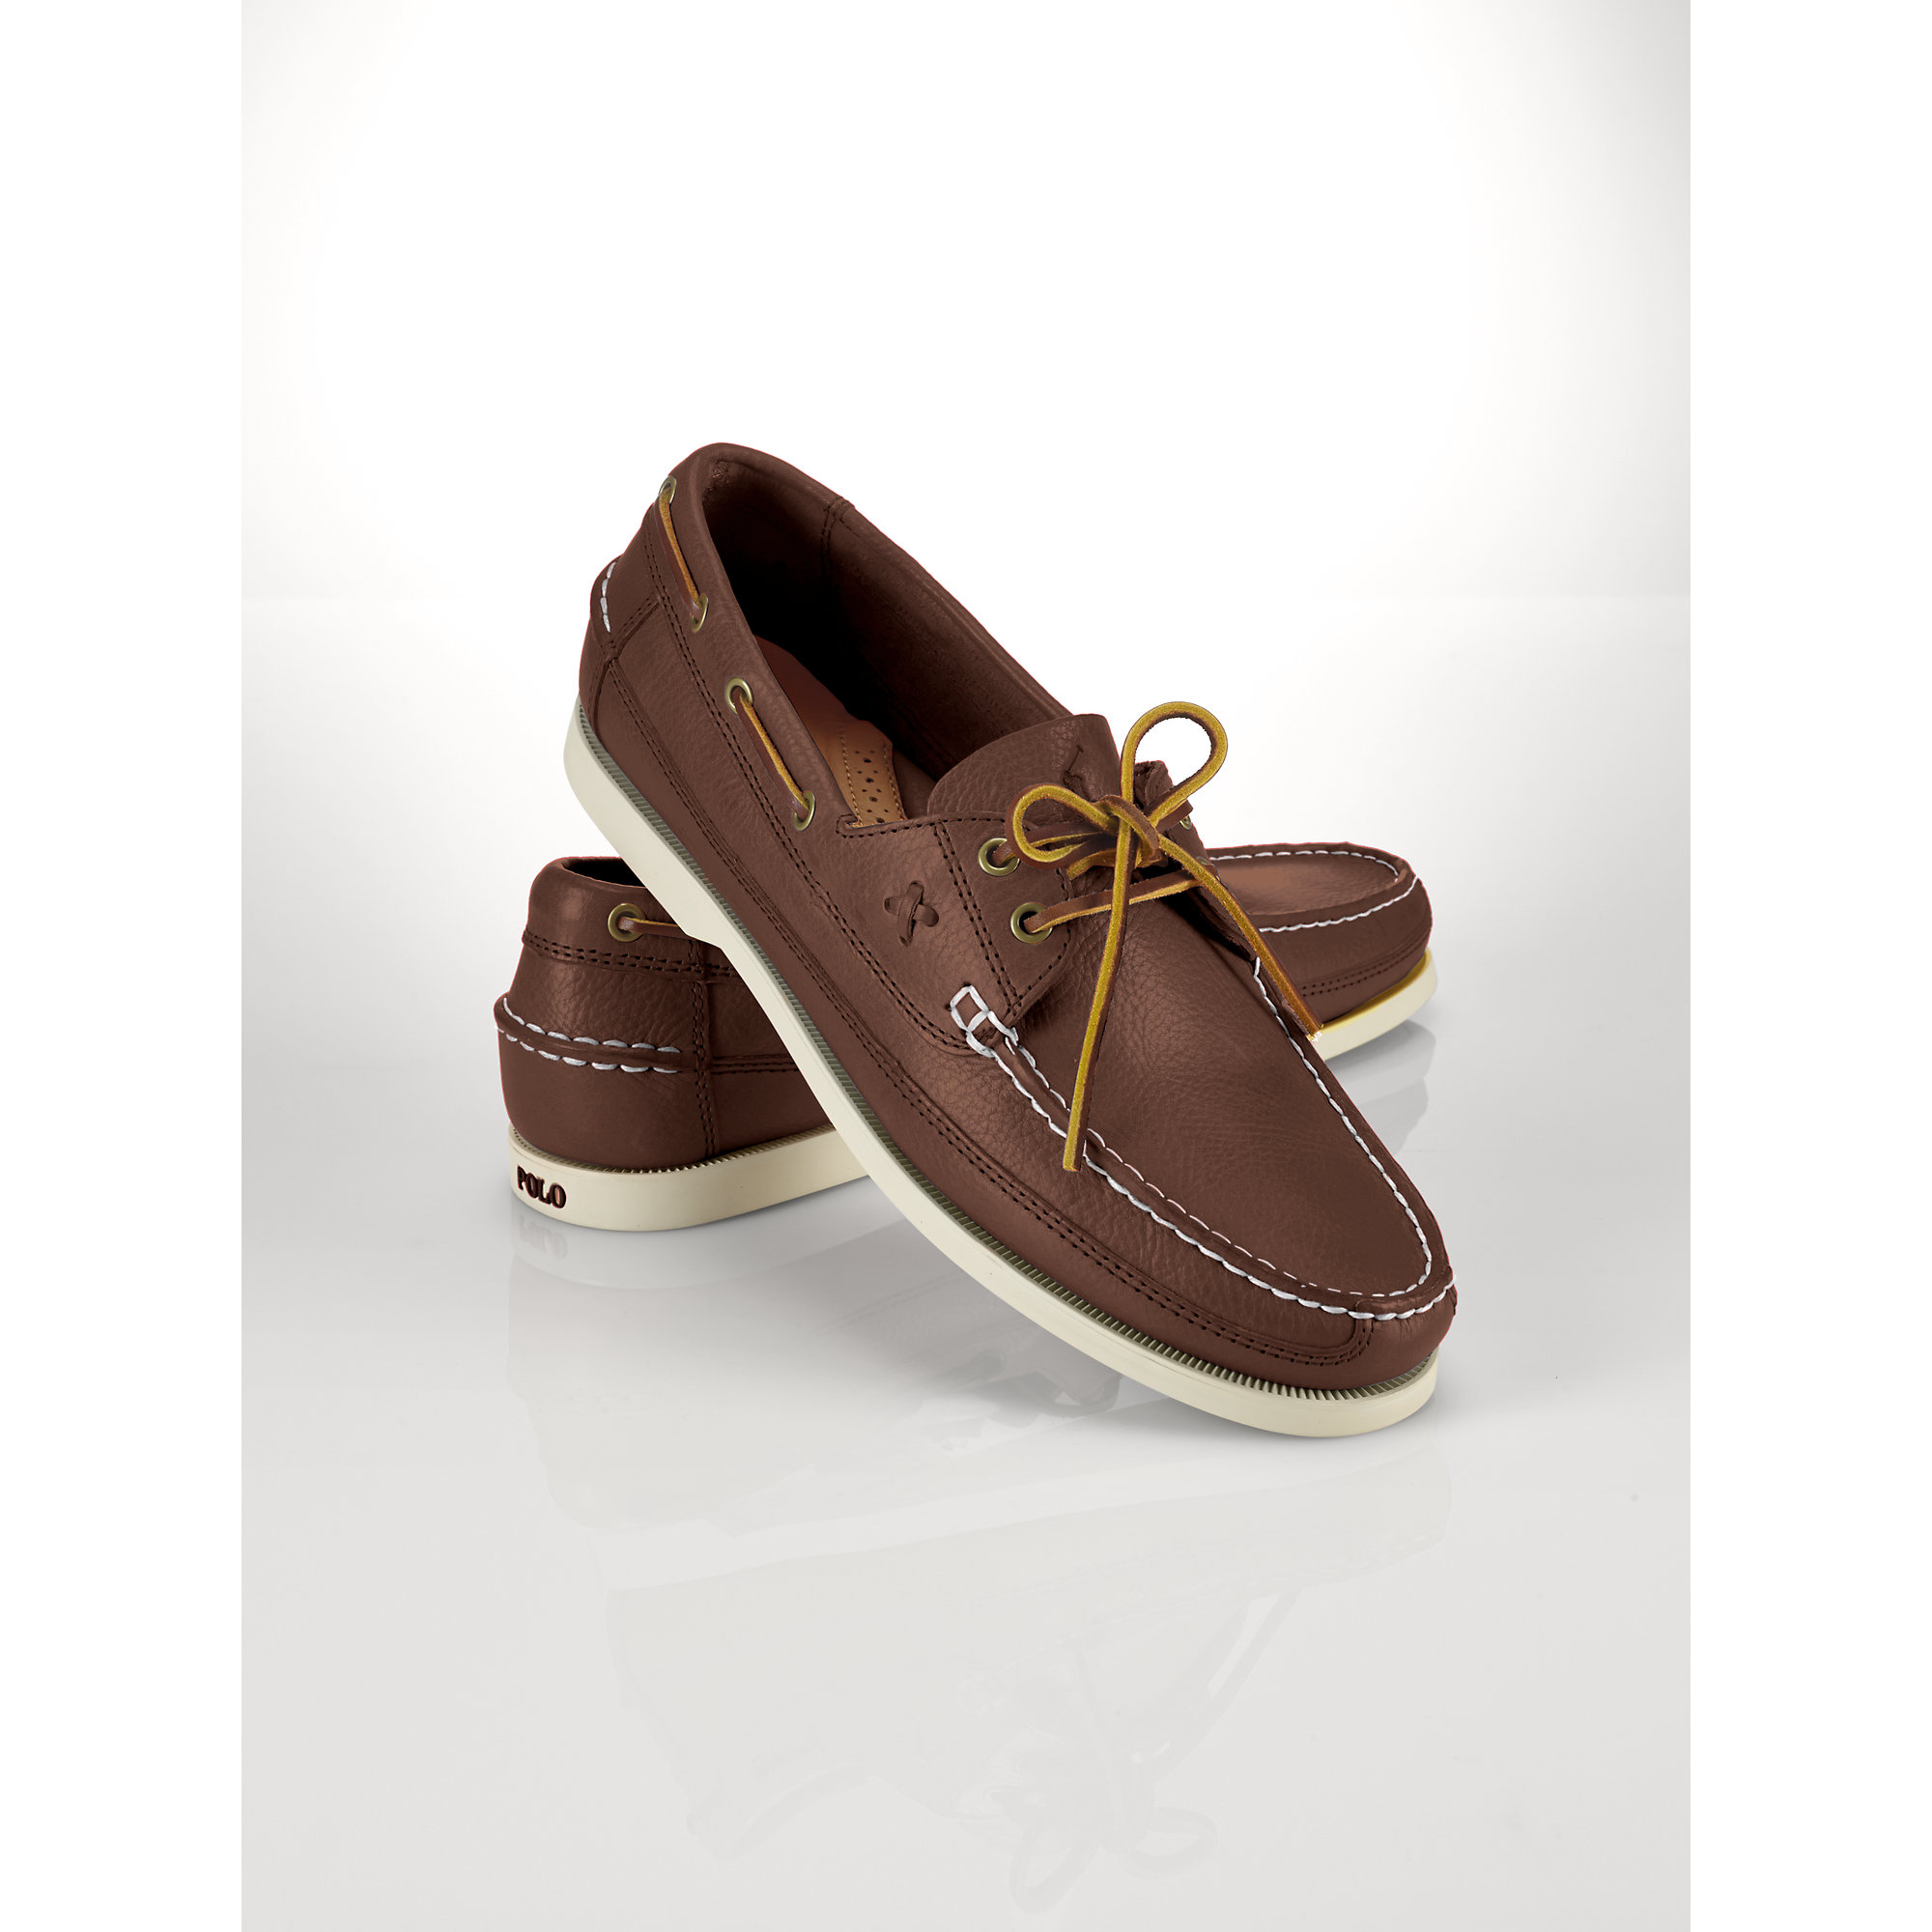 dab9b19cab8 Lyst - Polo Ralph Lauren Barnard Boat Shoe in Brown for Men